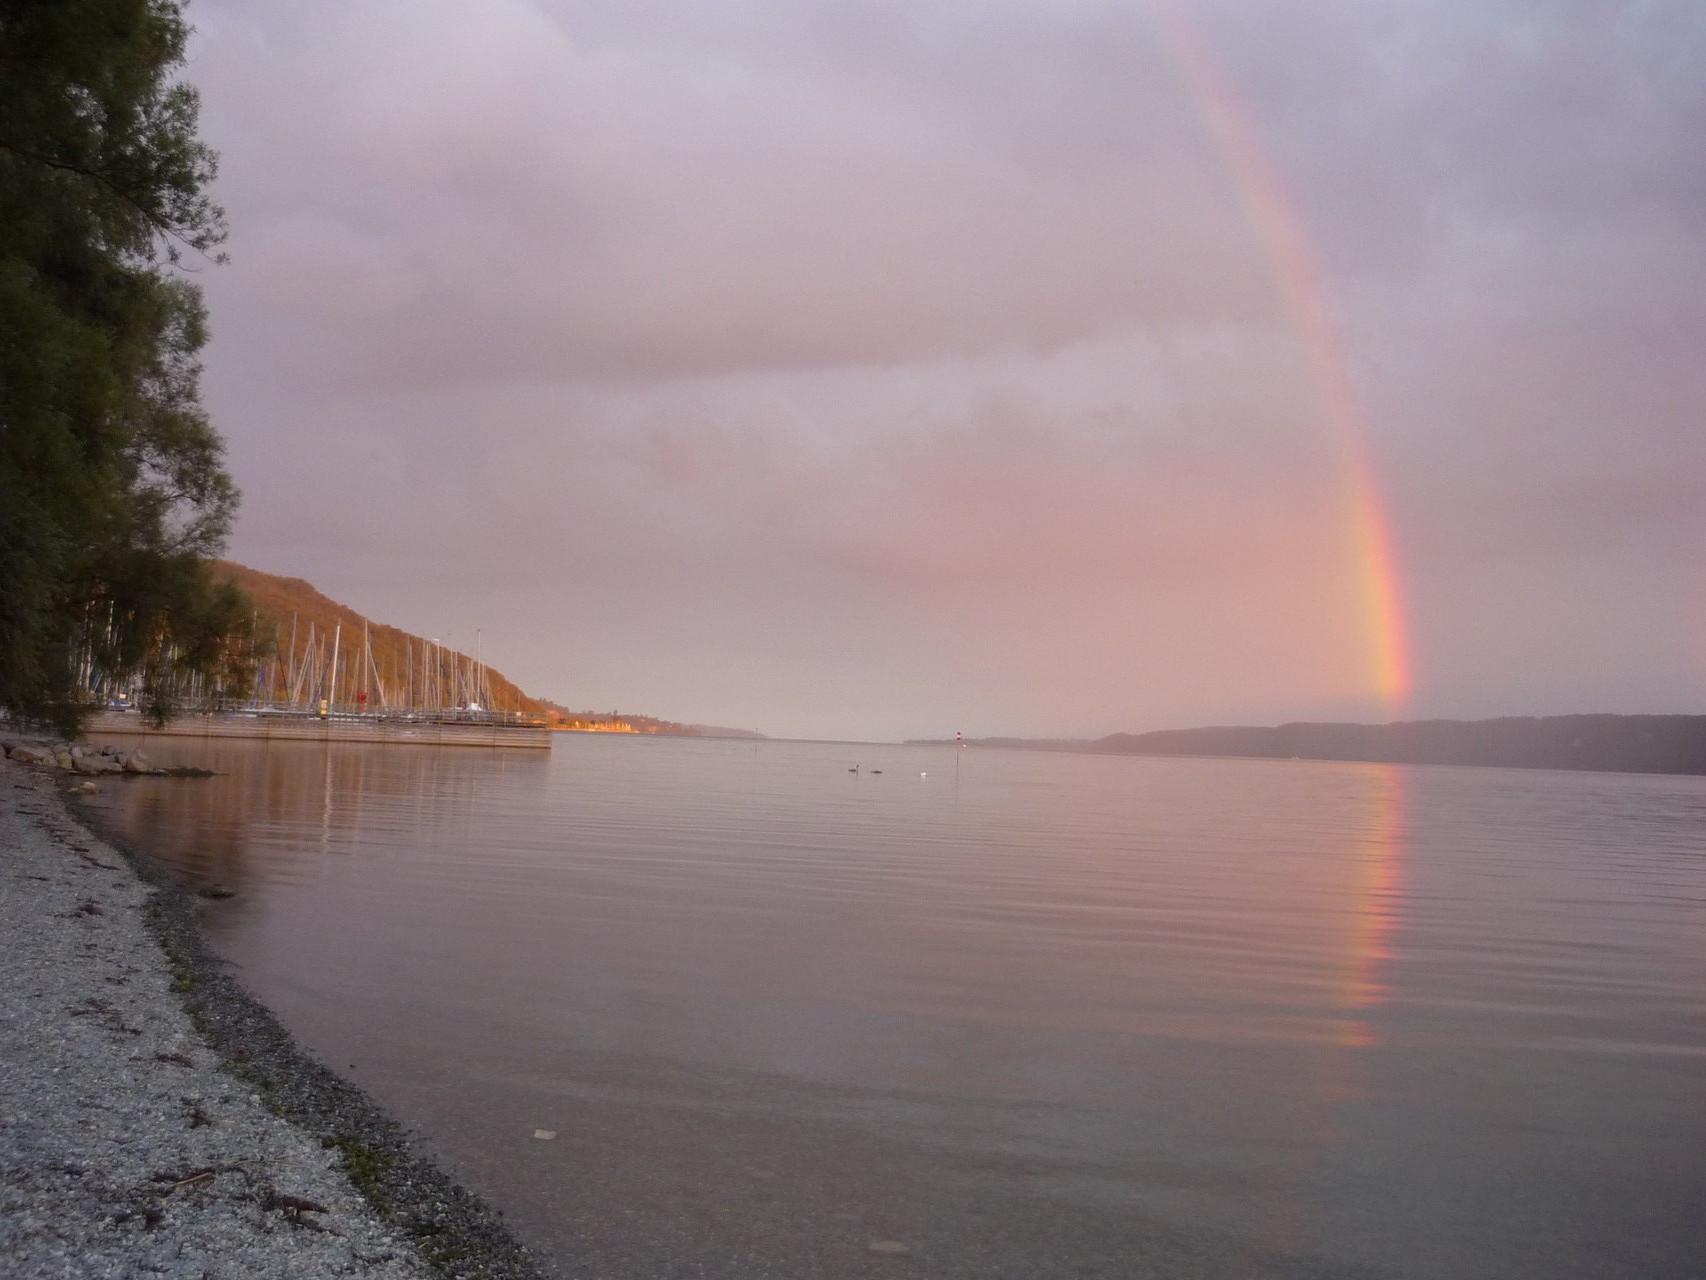 Sipplingen unter dem Regenbogen